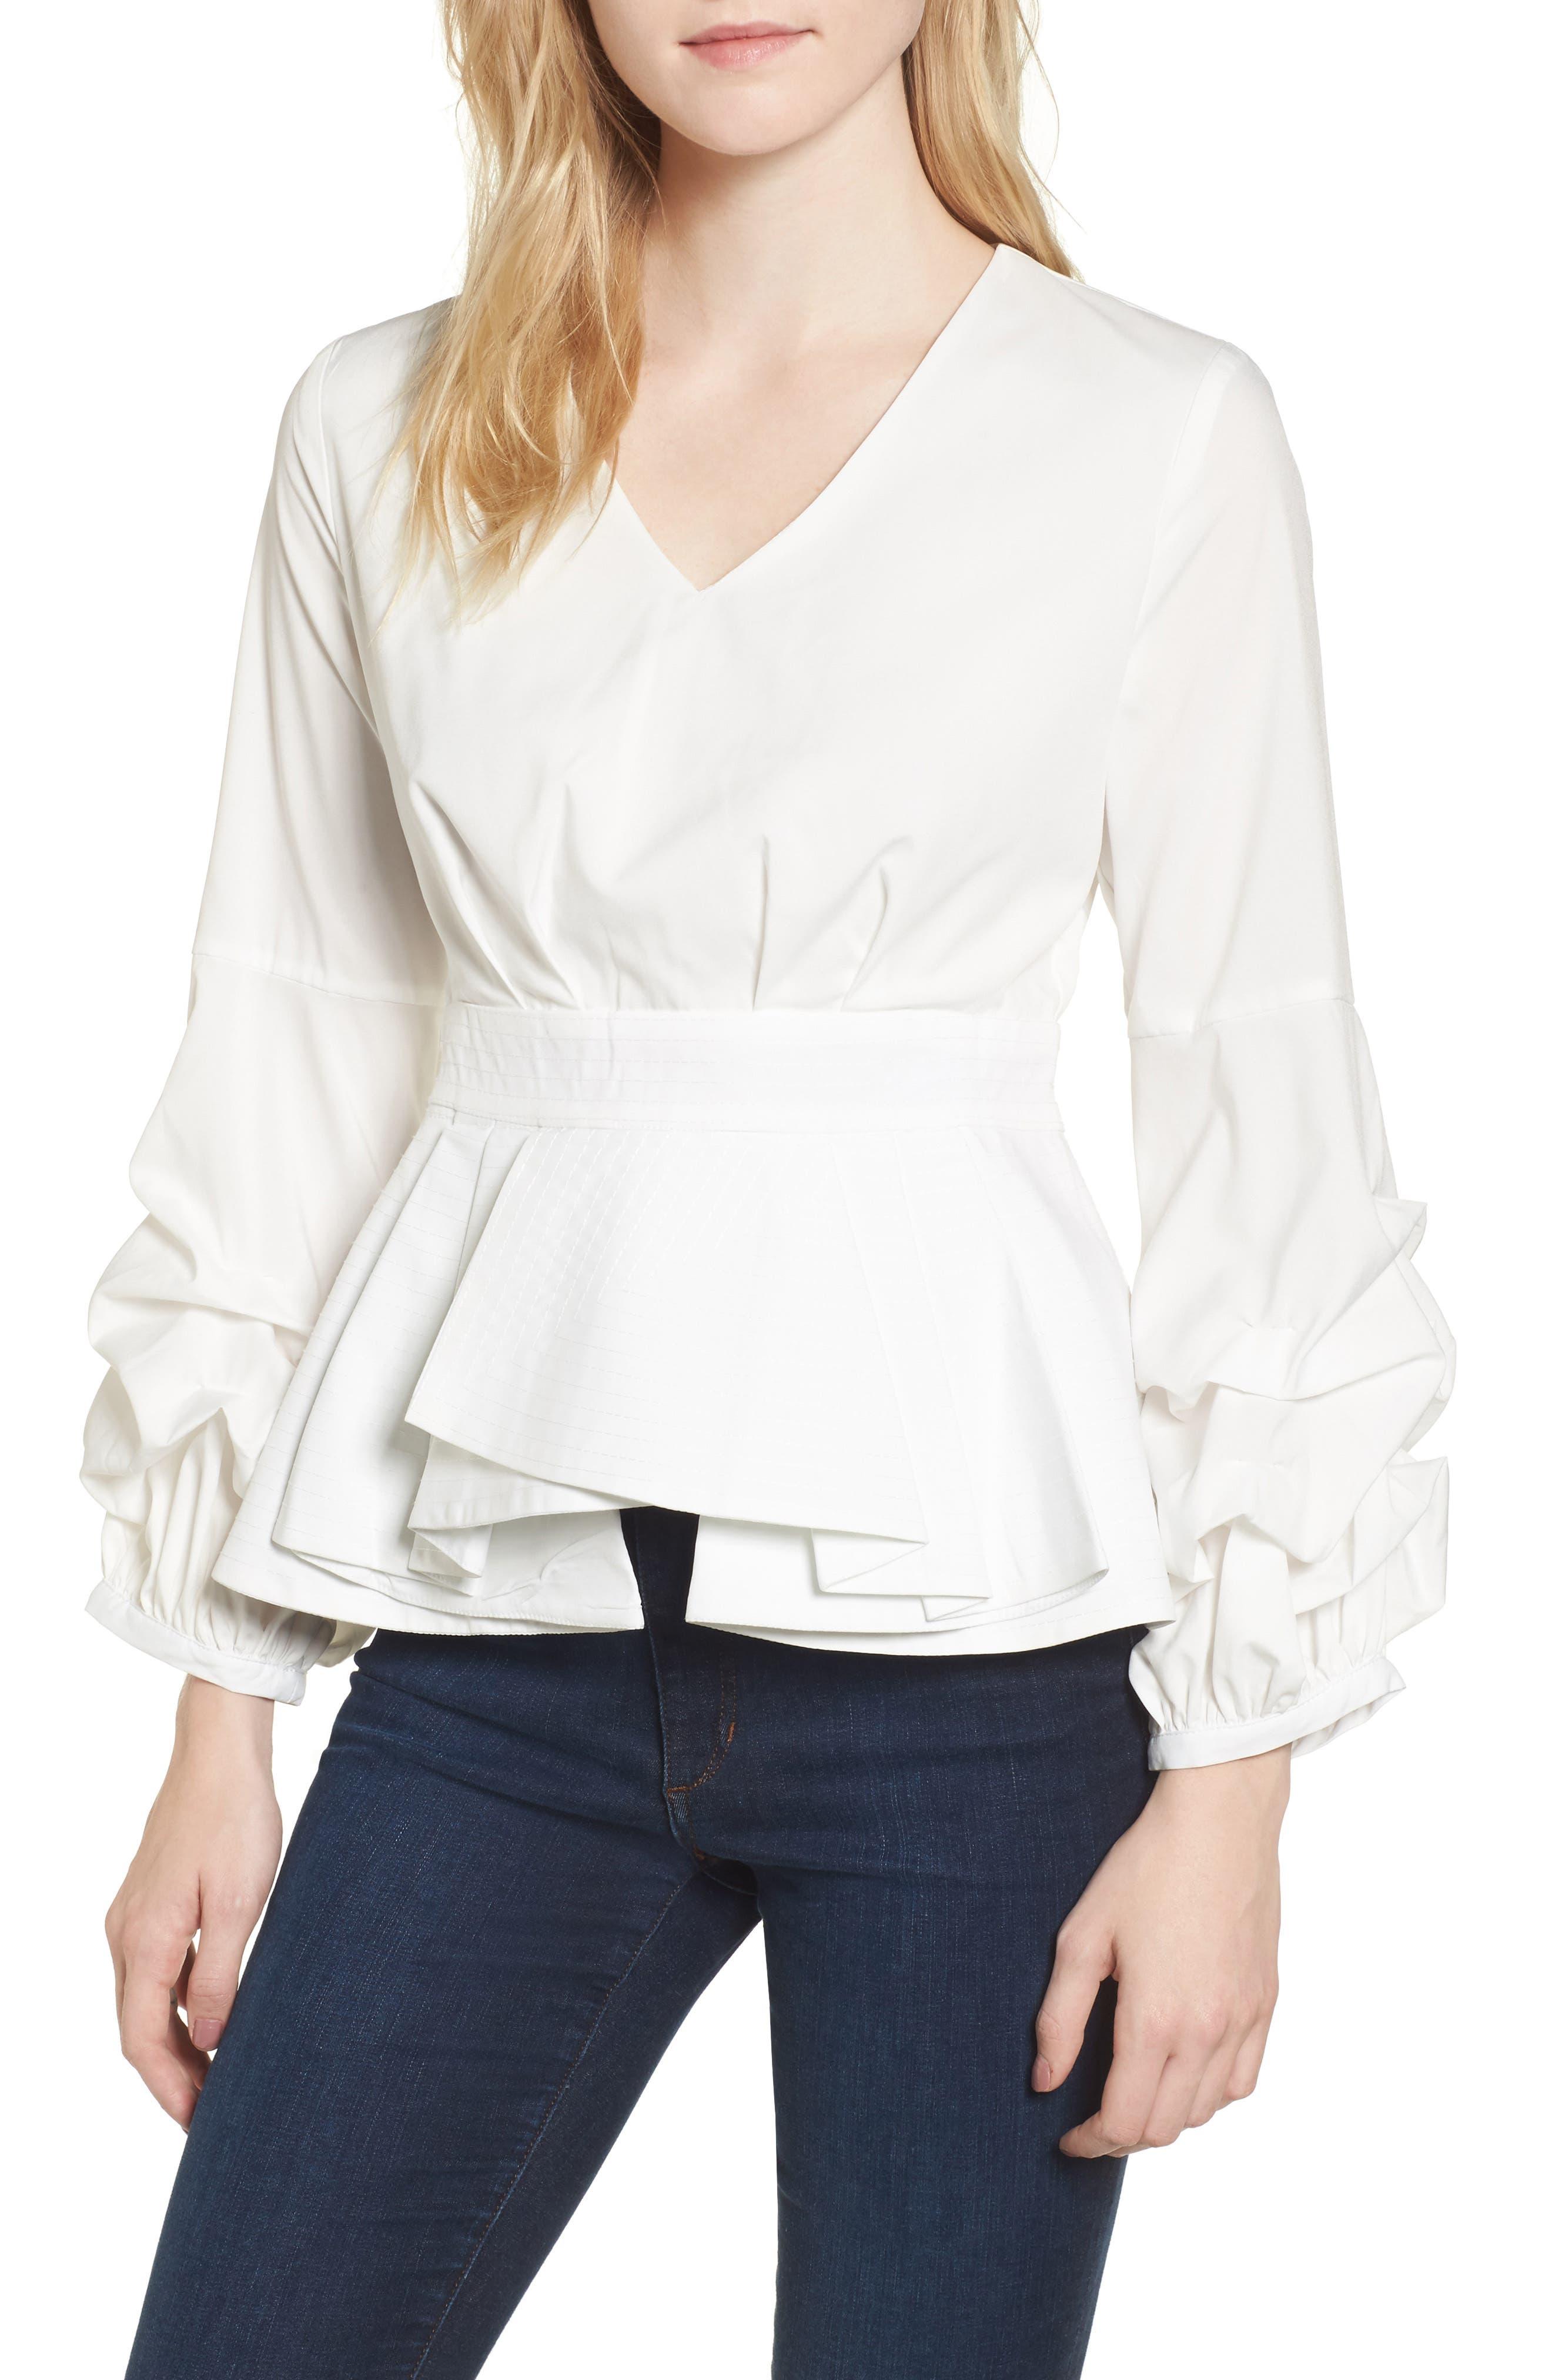 Alternate Image 1 Selected - StyleKeepers Magnolia Blouse